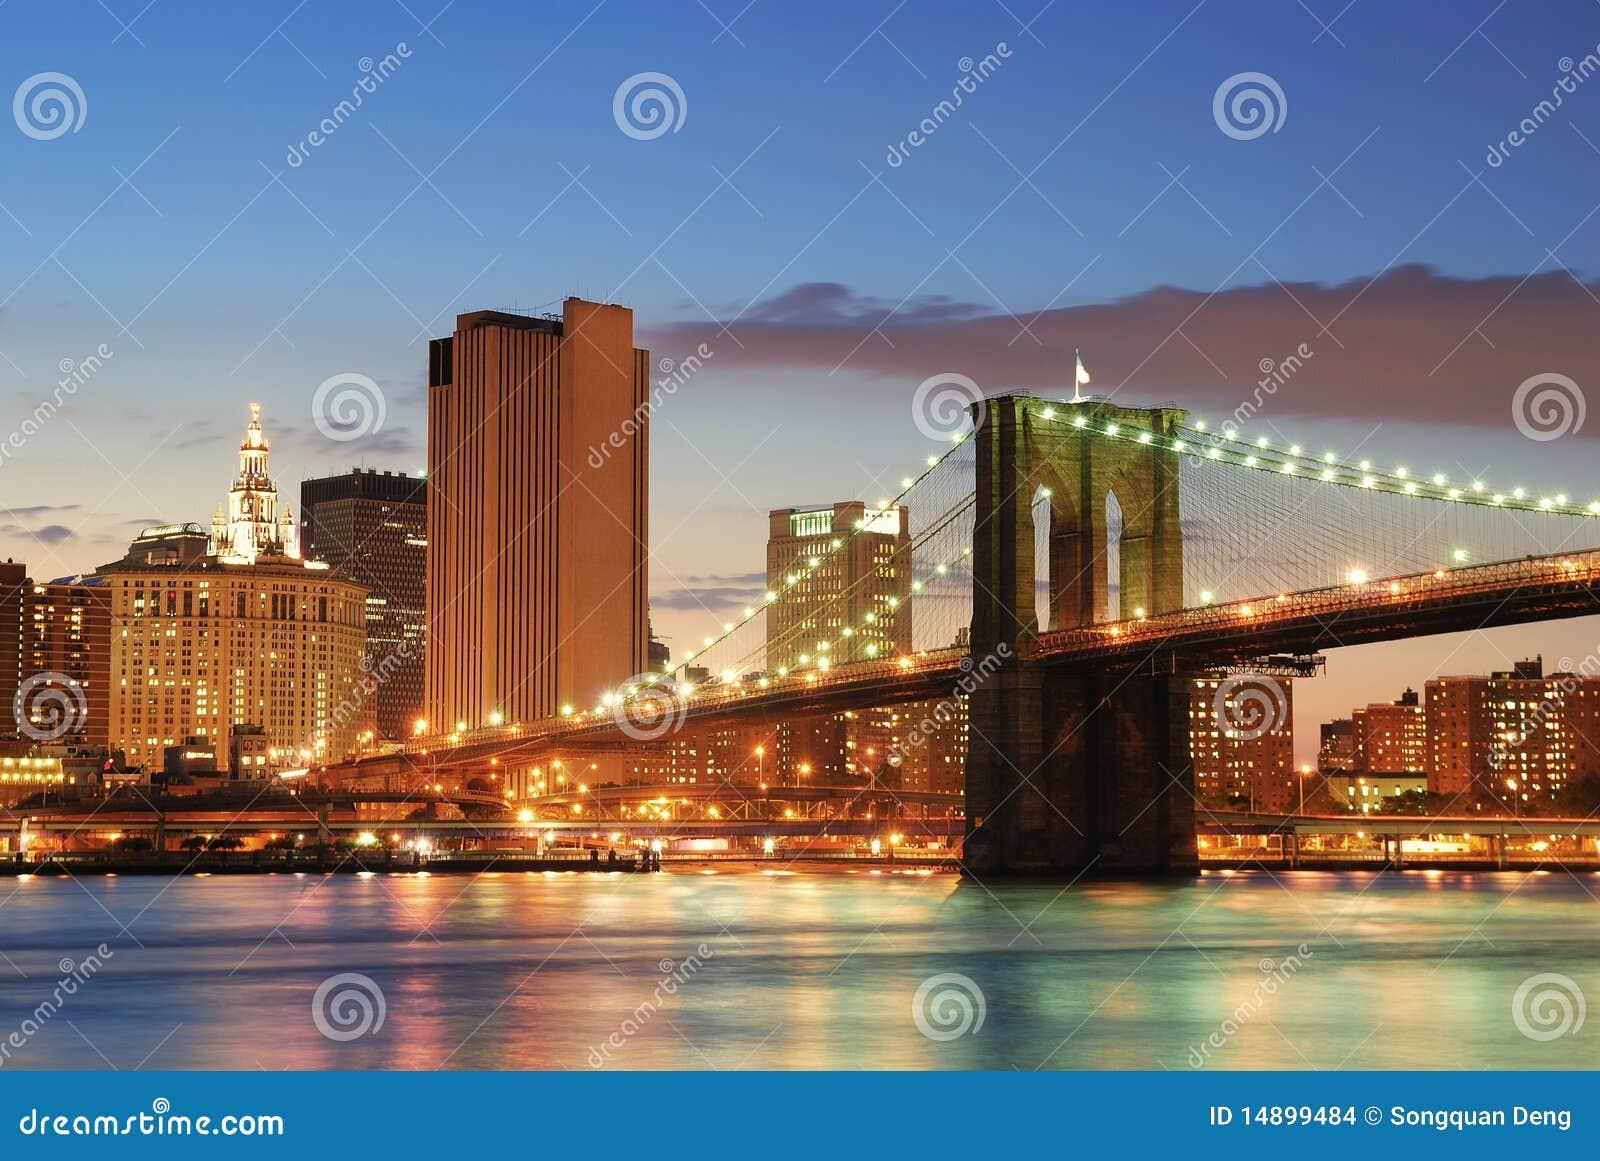 New york city manhattan skyline and brooklyn bridge at dusk over